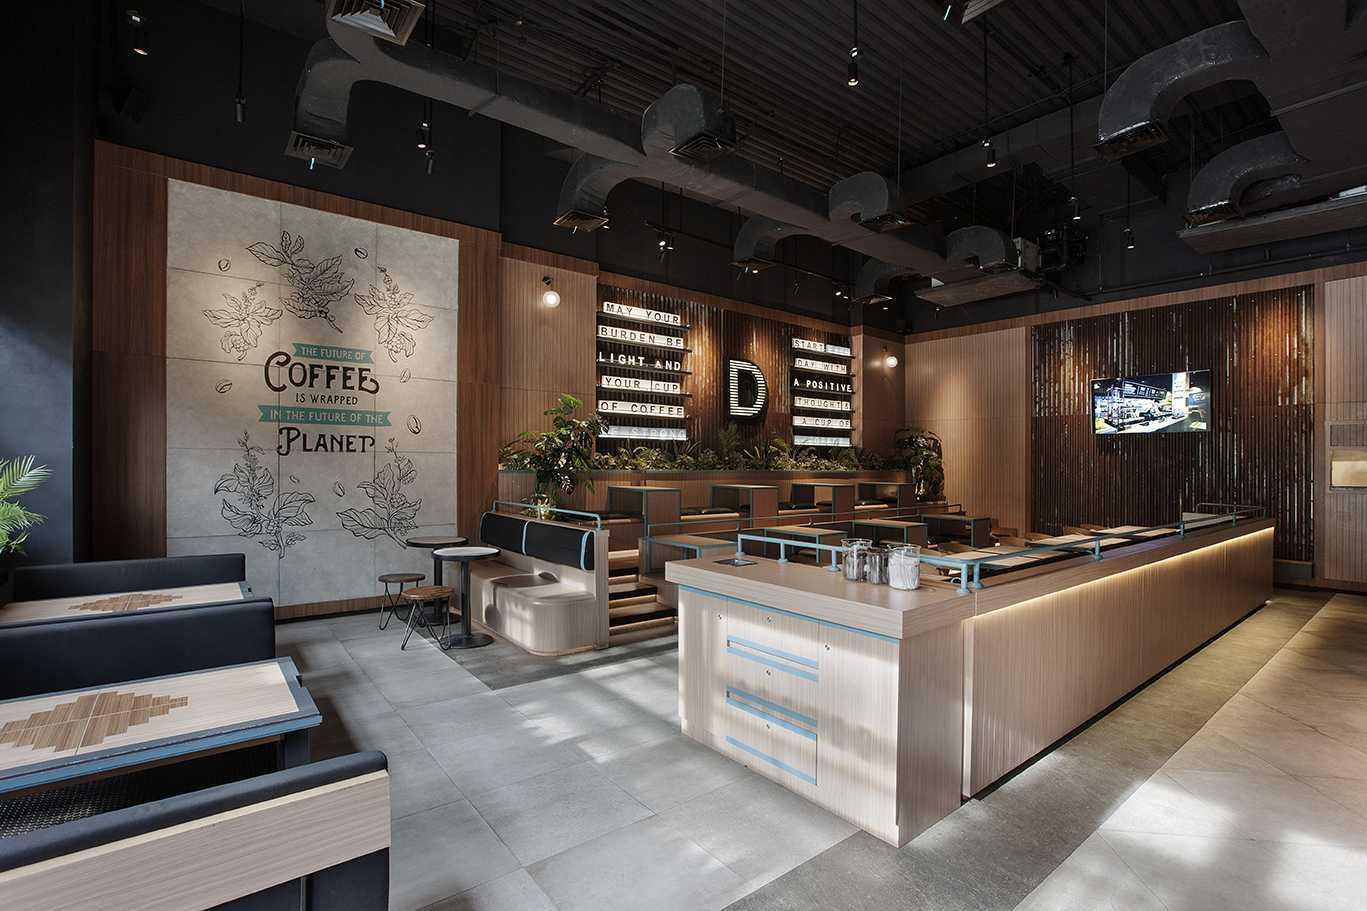 Highstreet Djournal Coffee Bar Cipedes, Kec. Sukajadi, Kota Bandung, Jawa Barat, Indonesia Cipedes, Kec. Sukajadi, Kota Bandung, Jawa Barat, Indonesia Highstreetstudio-Djournal-Coffee-Bar  74361